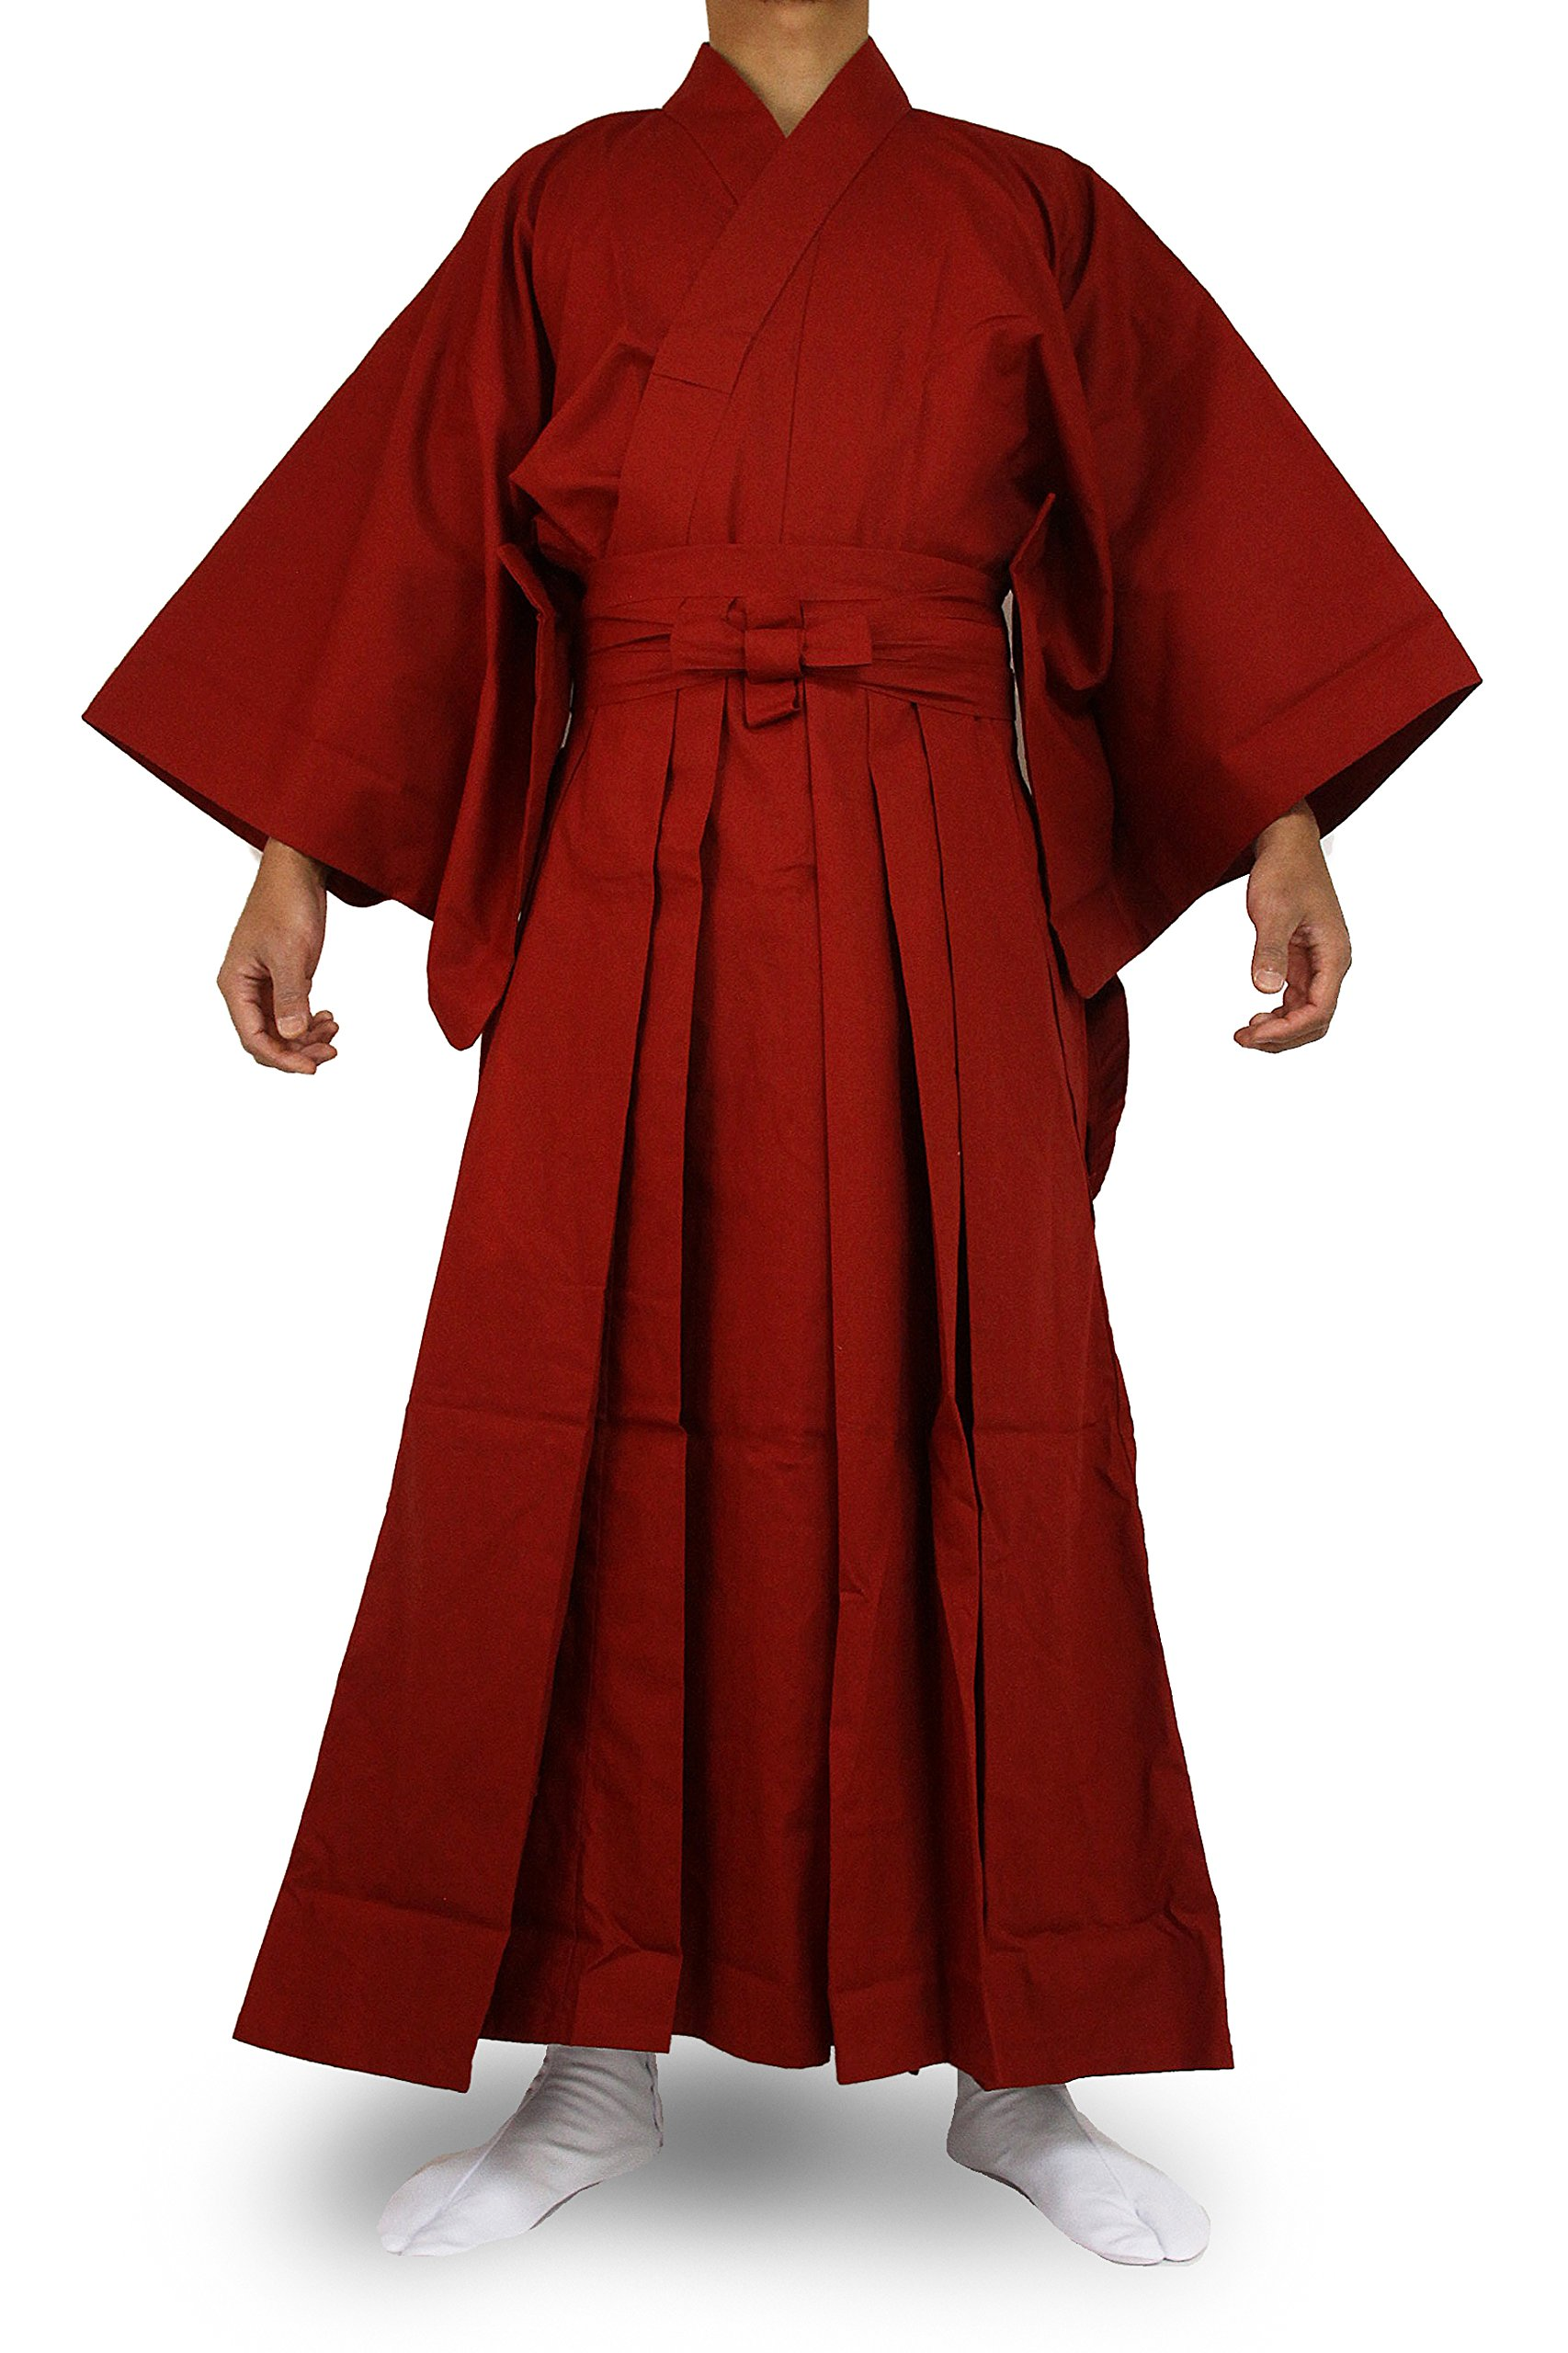 Edoten Japanese Samurai Hakama Uniform RD-RD L by Edoten (Image #1)